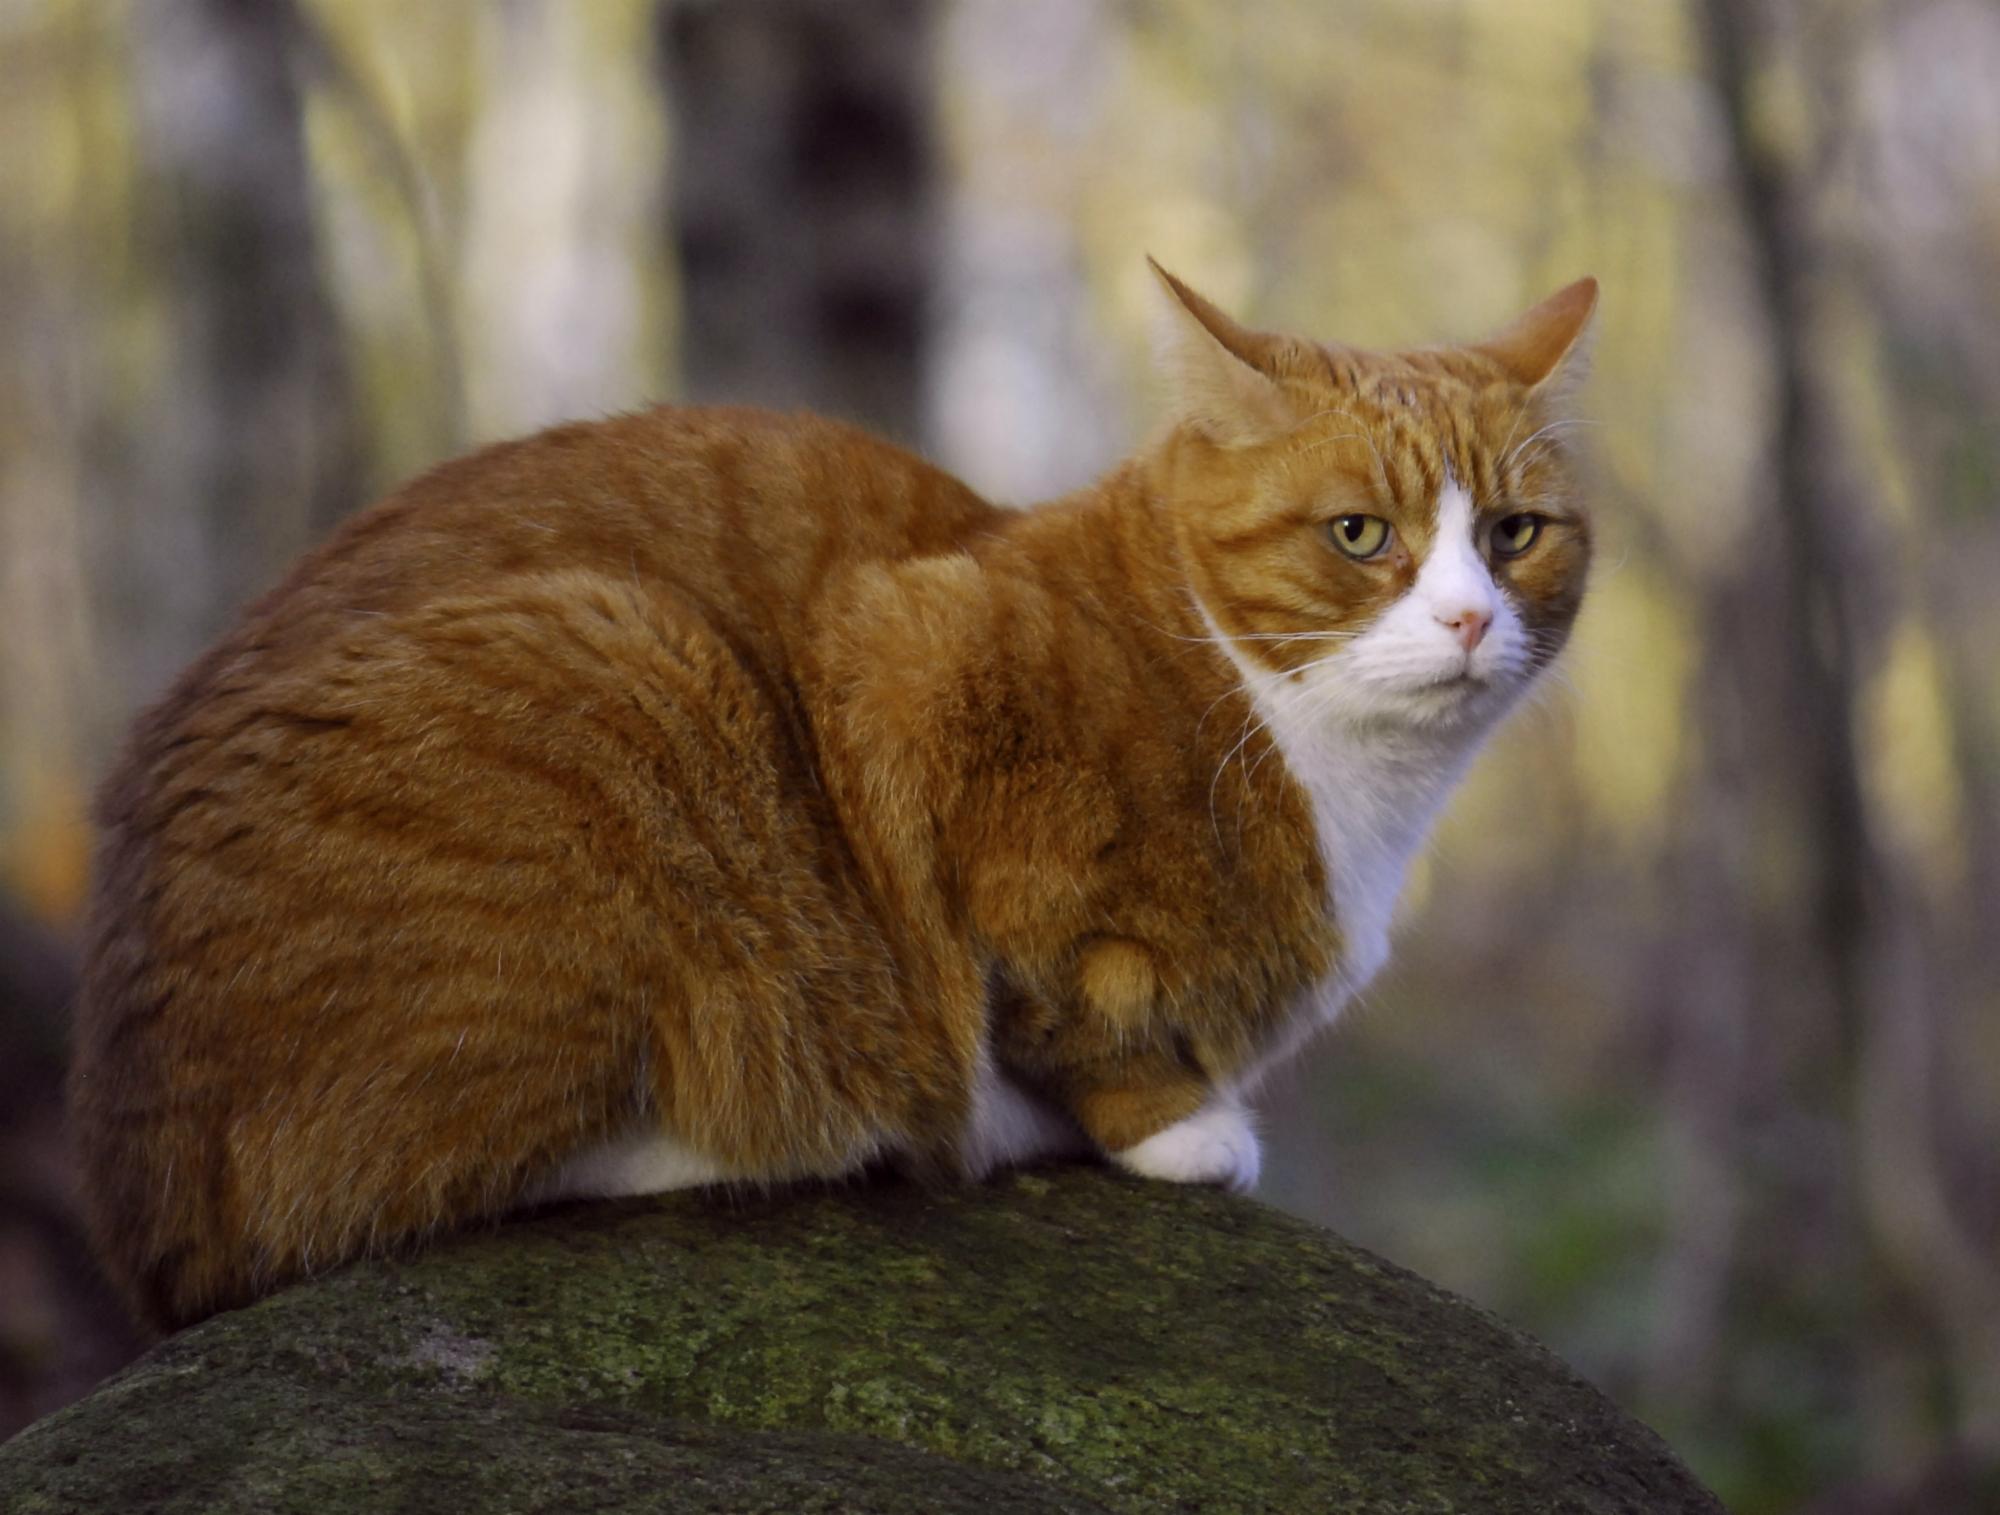 Кот на камушках  № 530536 бесплатно